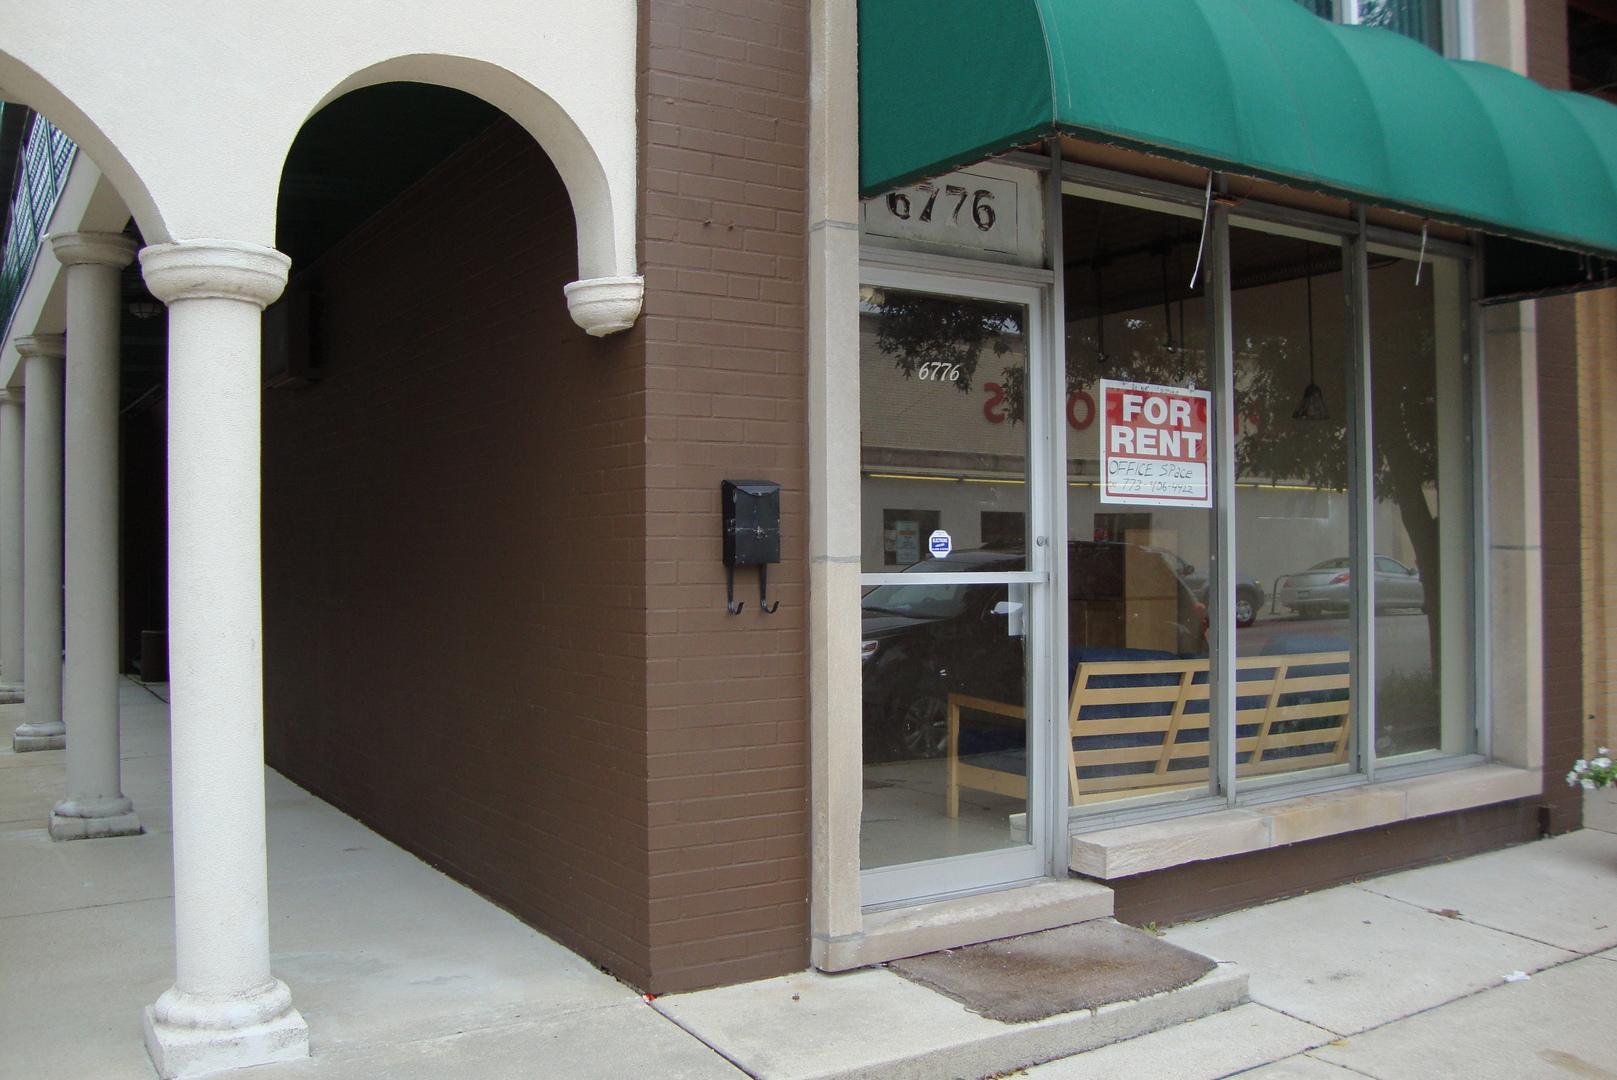 6776 Northwest Unit Unit 2d ,Chicago, Illinois 60631